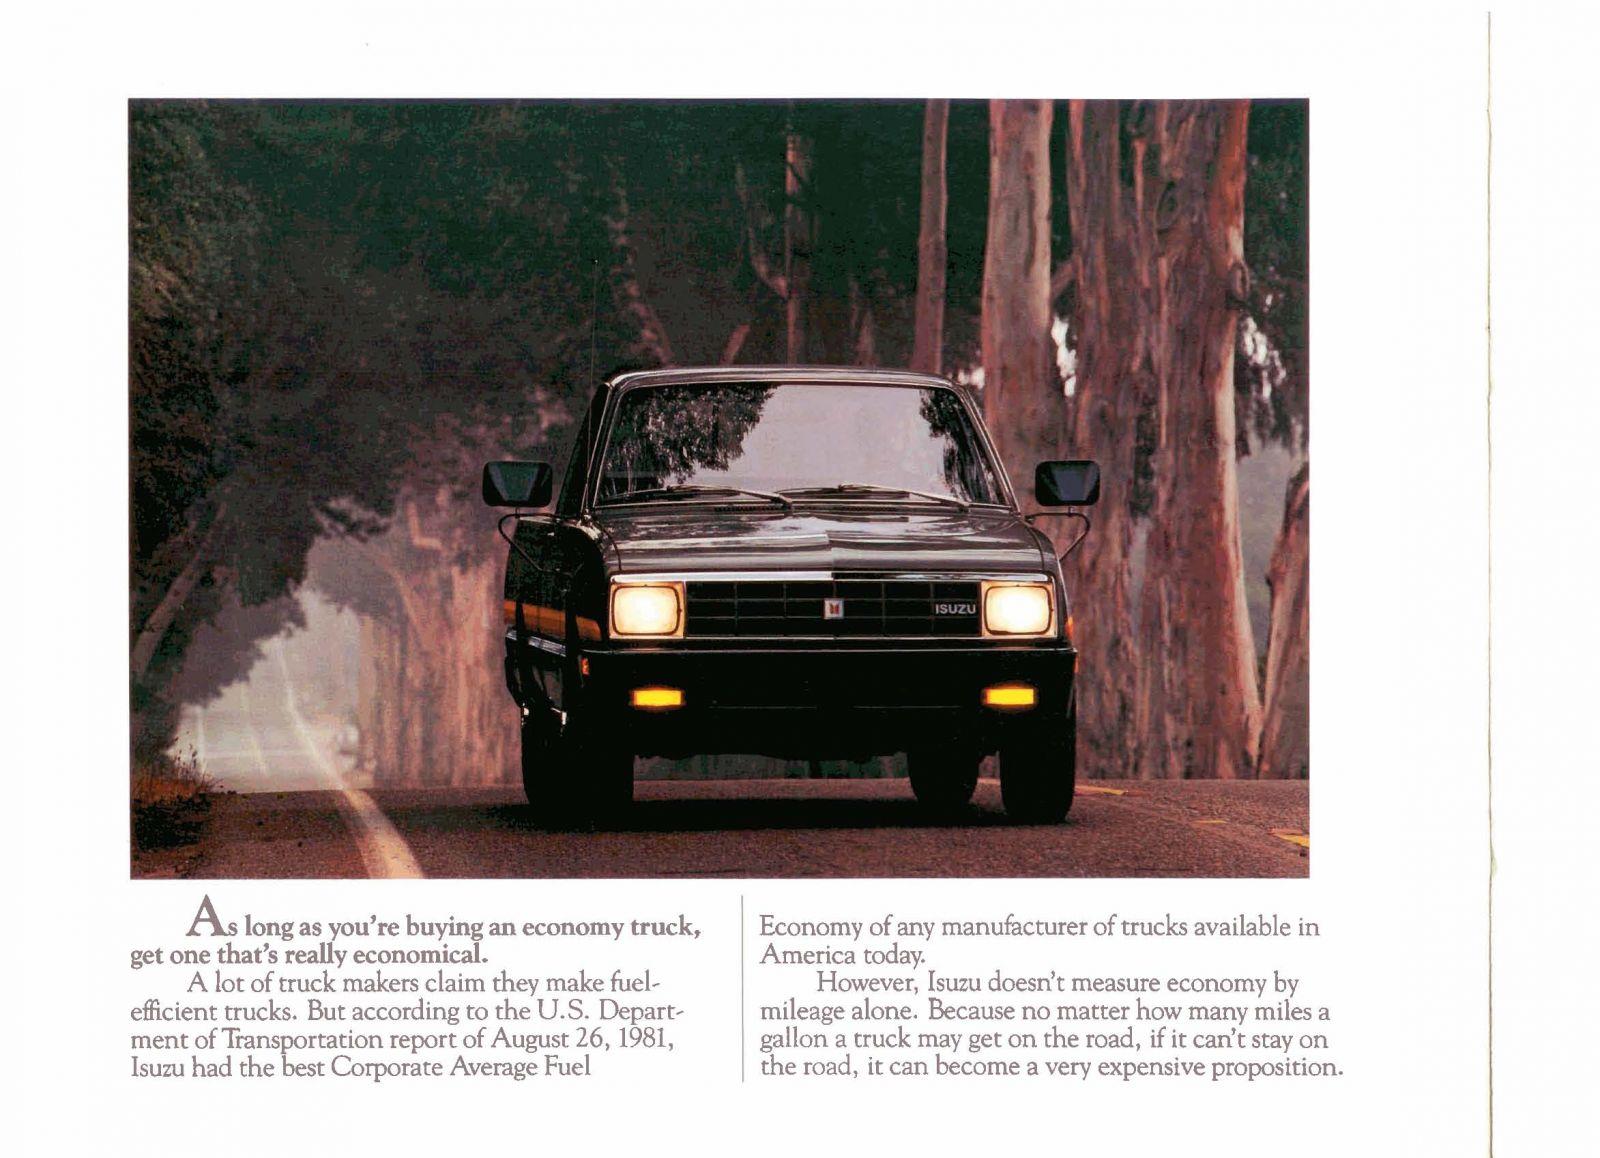 1982 Isuzu Pickups Page 02.jpg